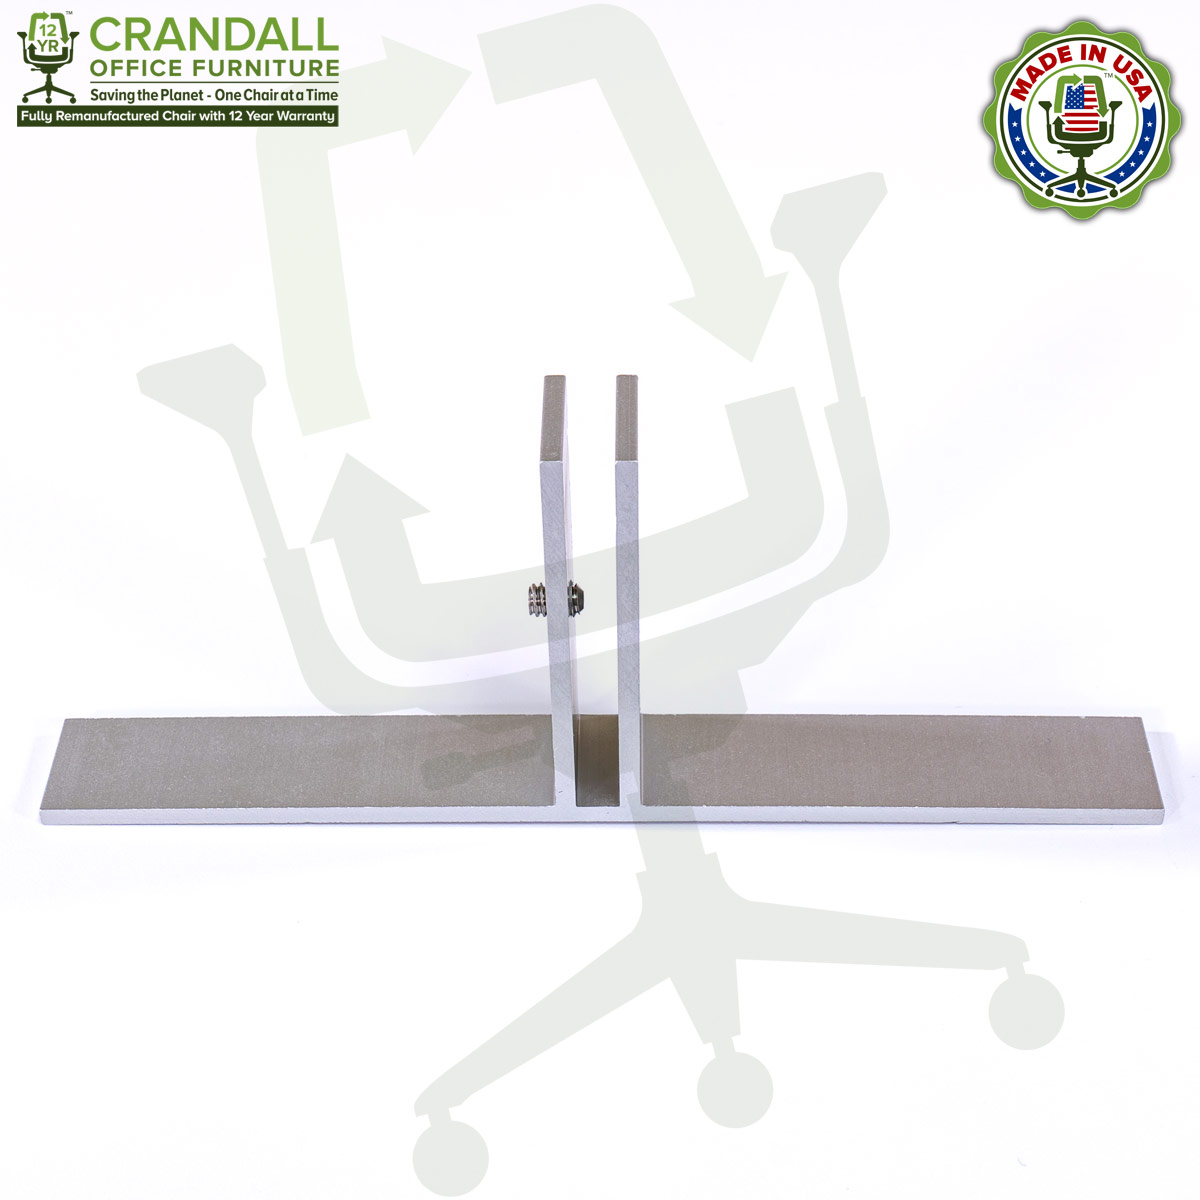 Table Top Free Standing Plexiglass & Acrylic Barrier Brackets 0002